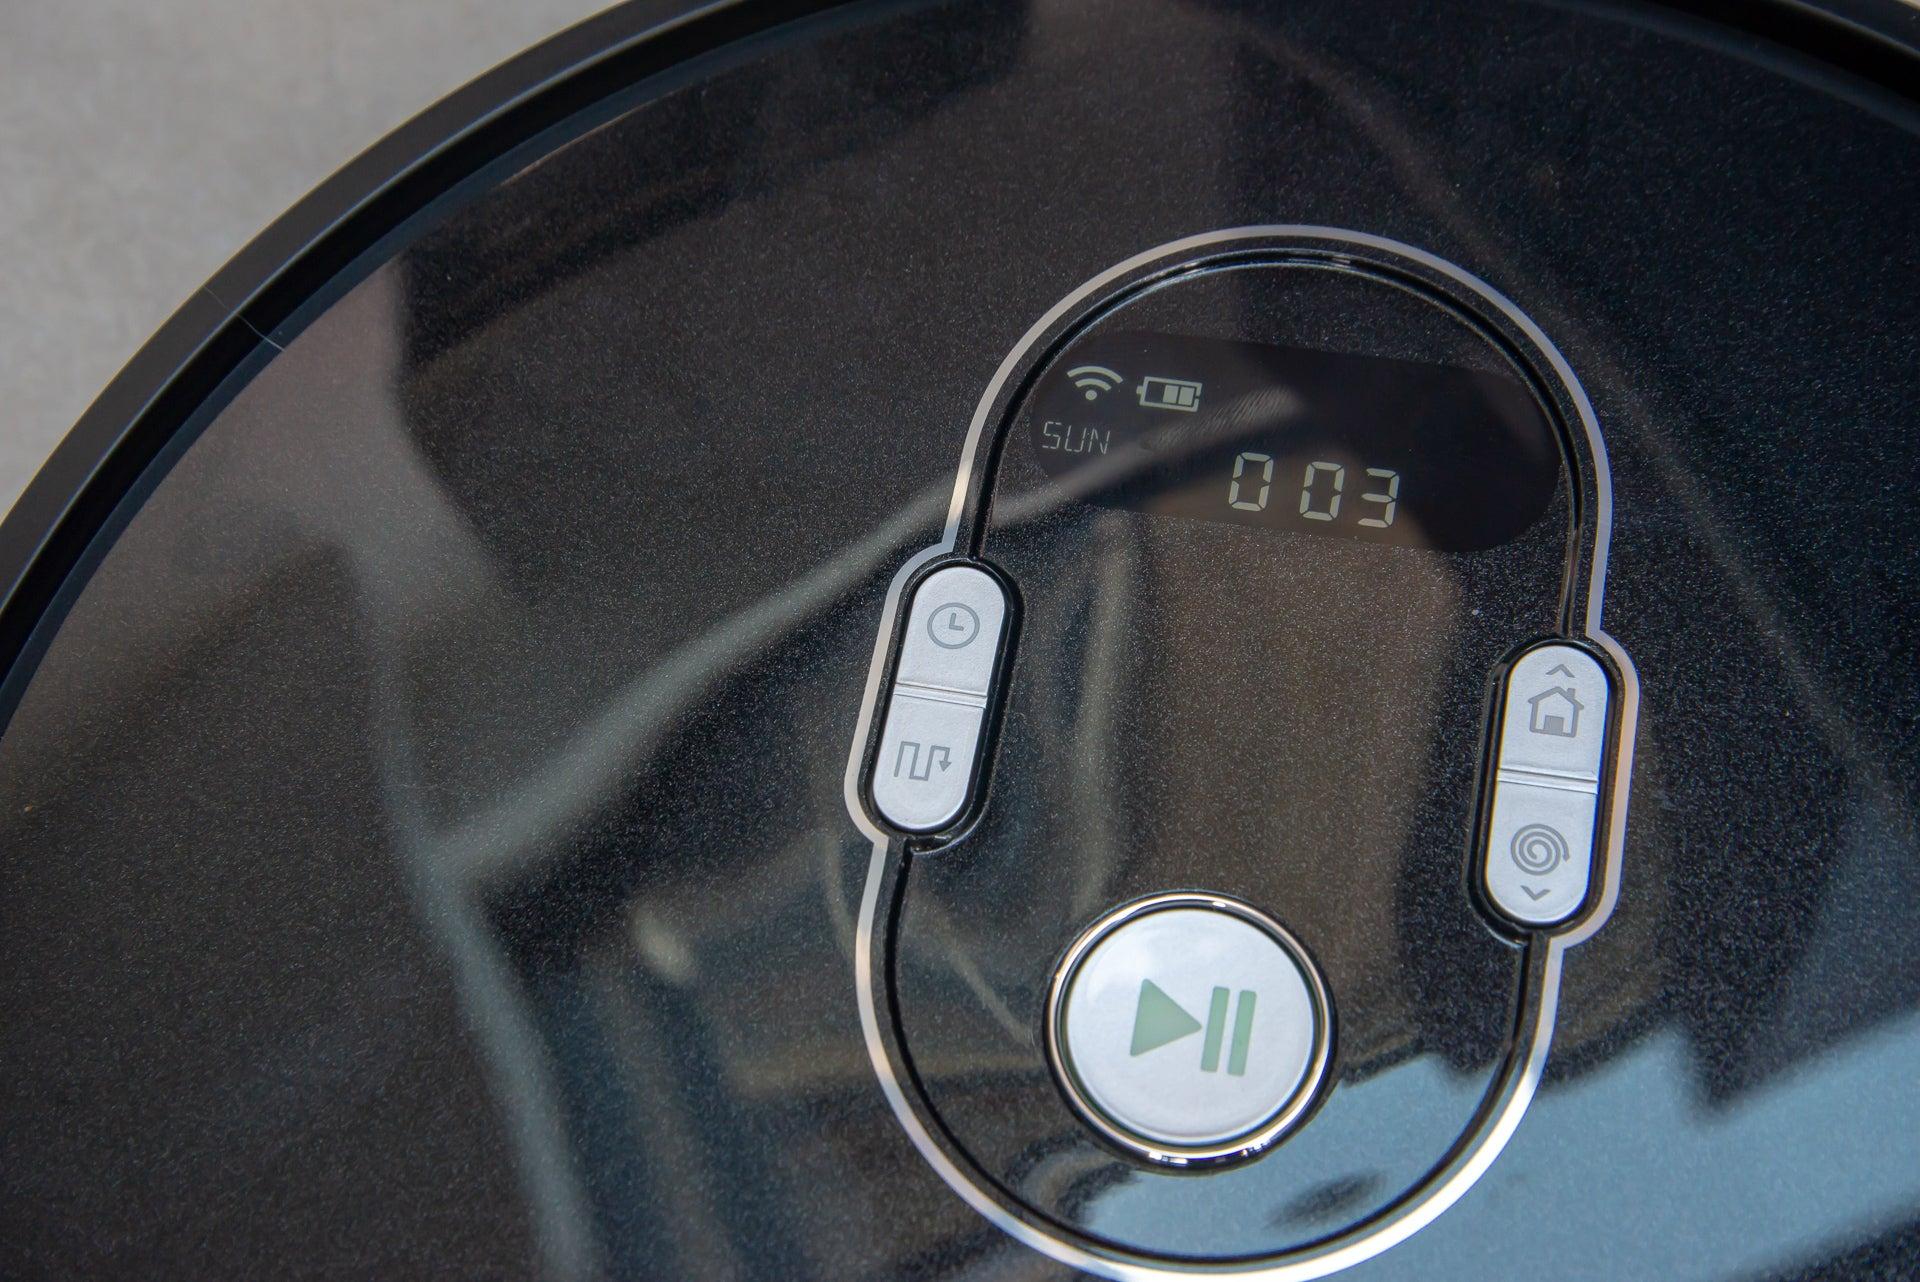 iLife A7 Robotic Vacuum Cleaner LCD